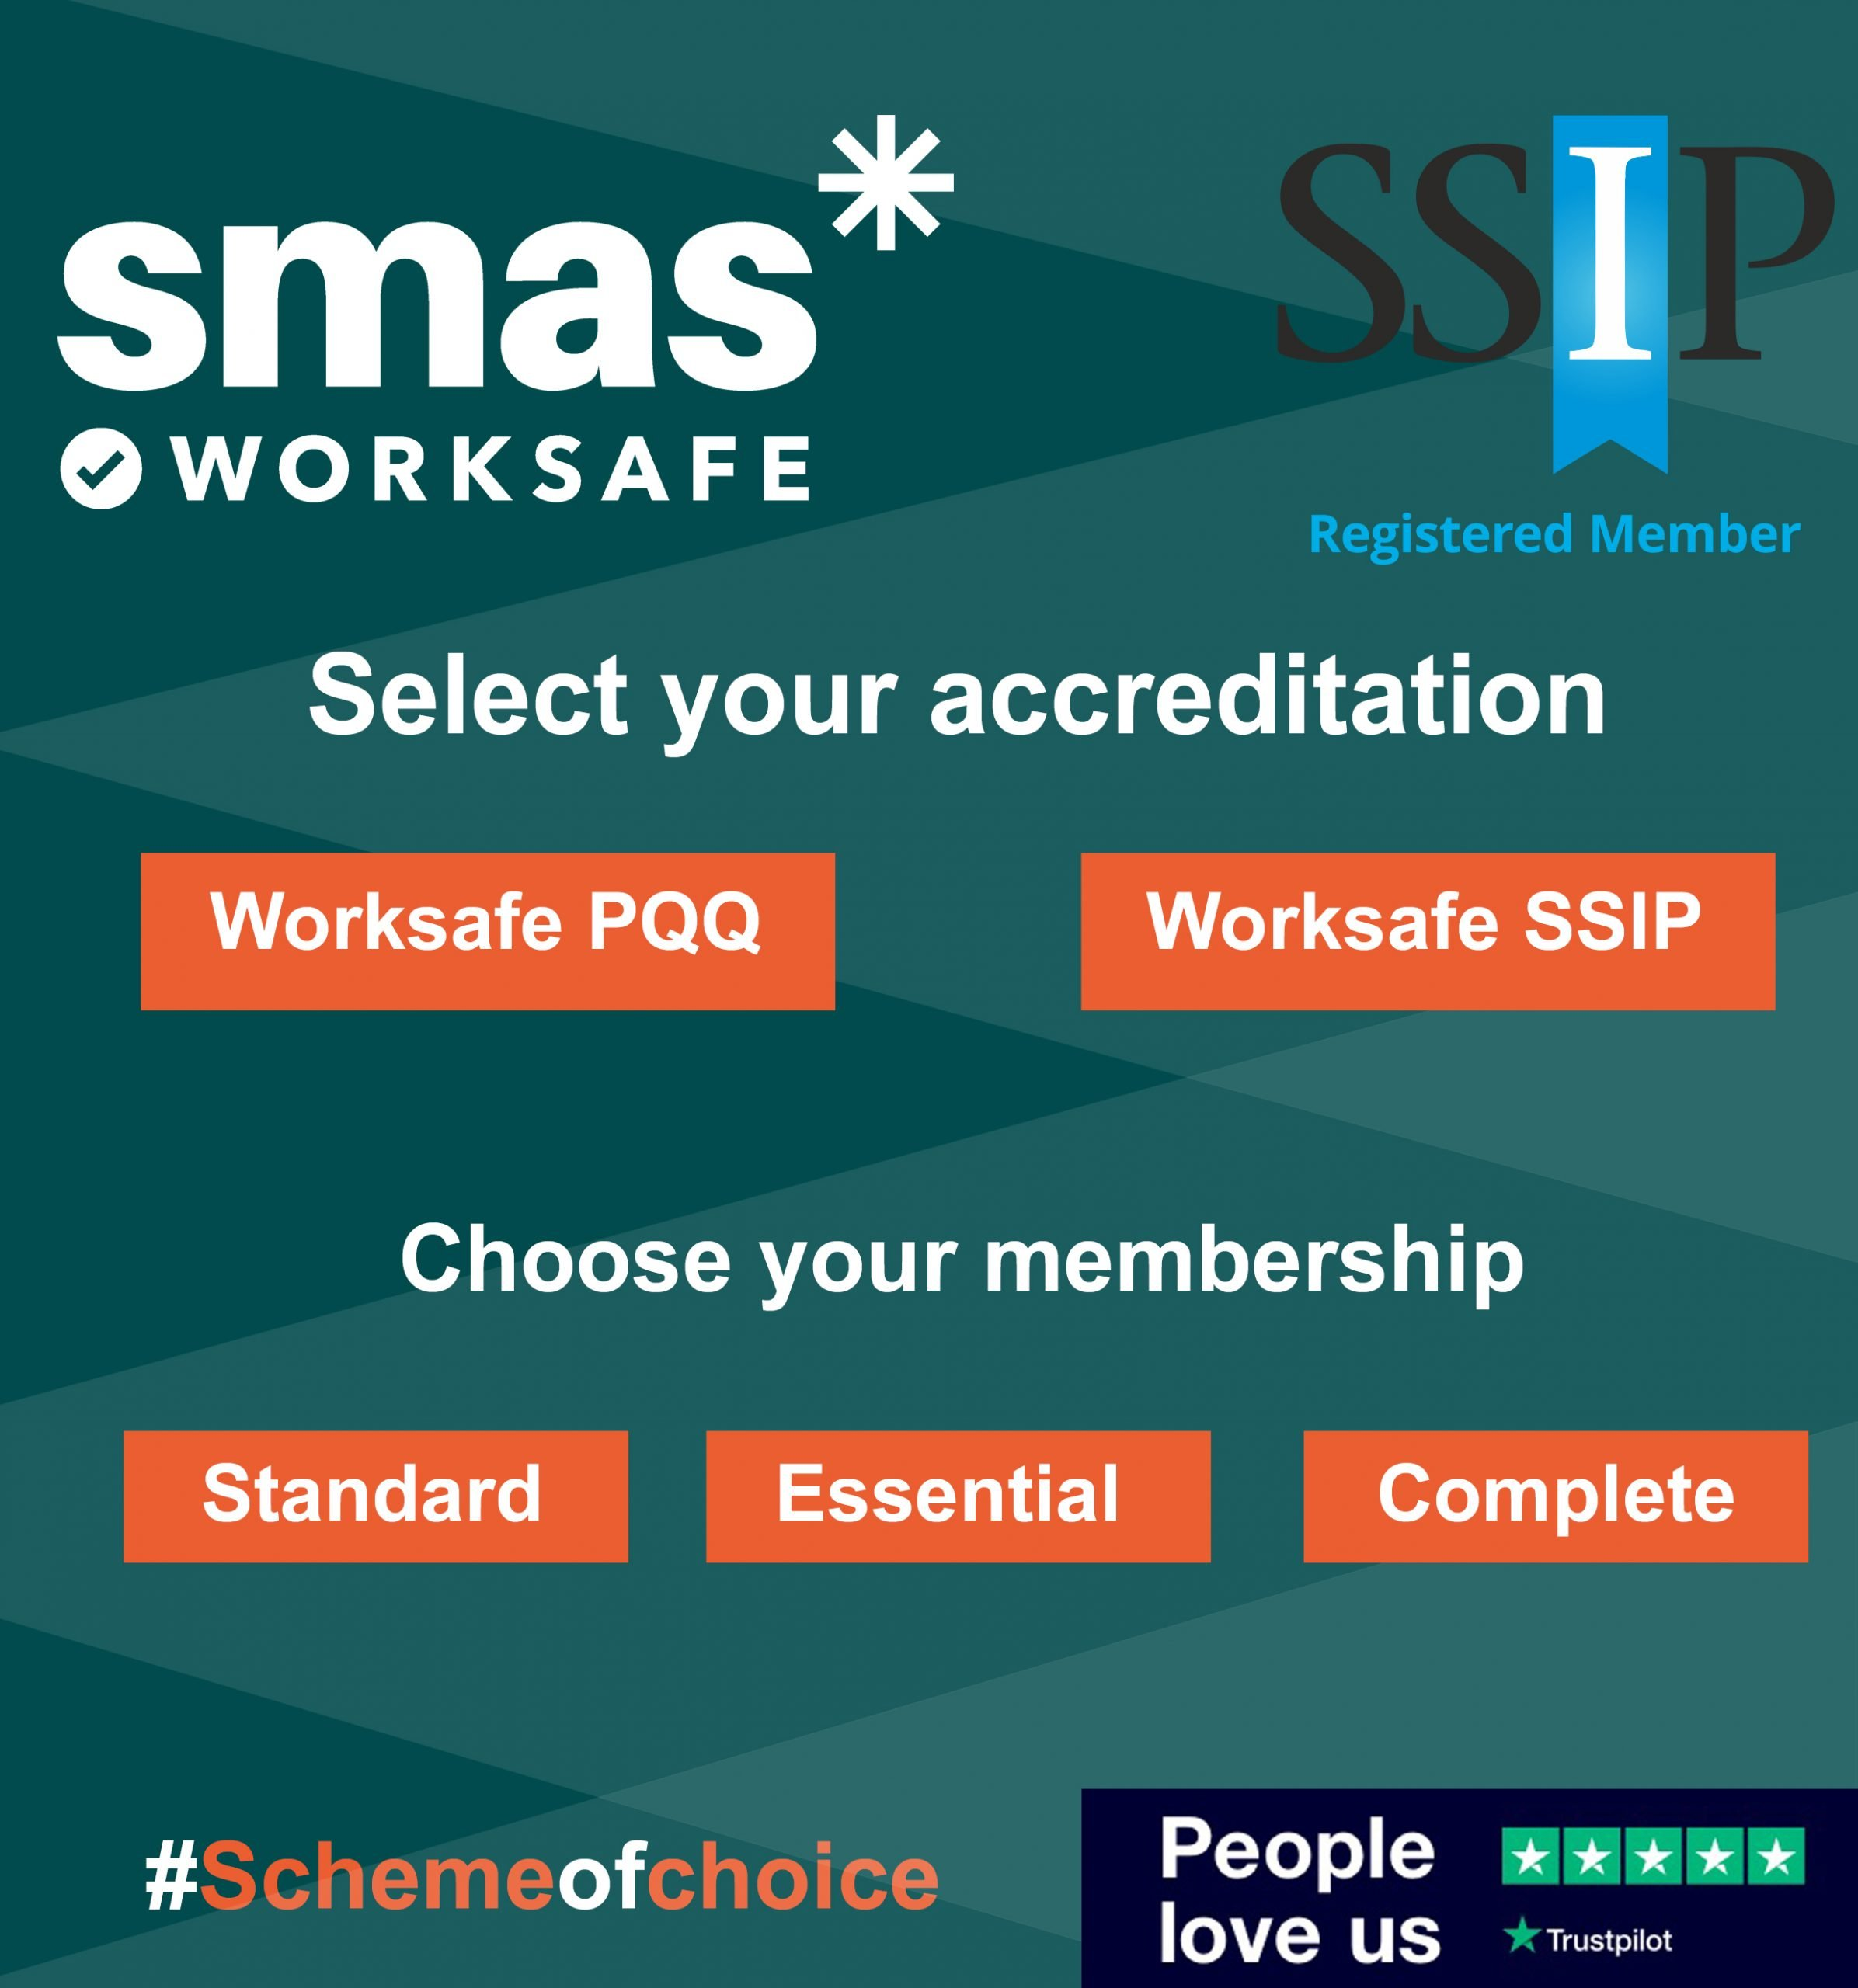 SMAS Worksafe accreditation and membership options